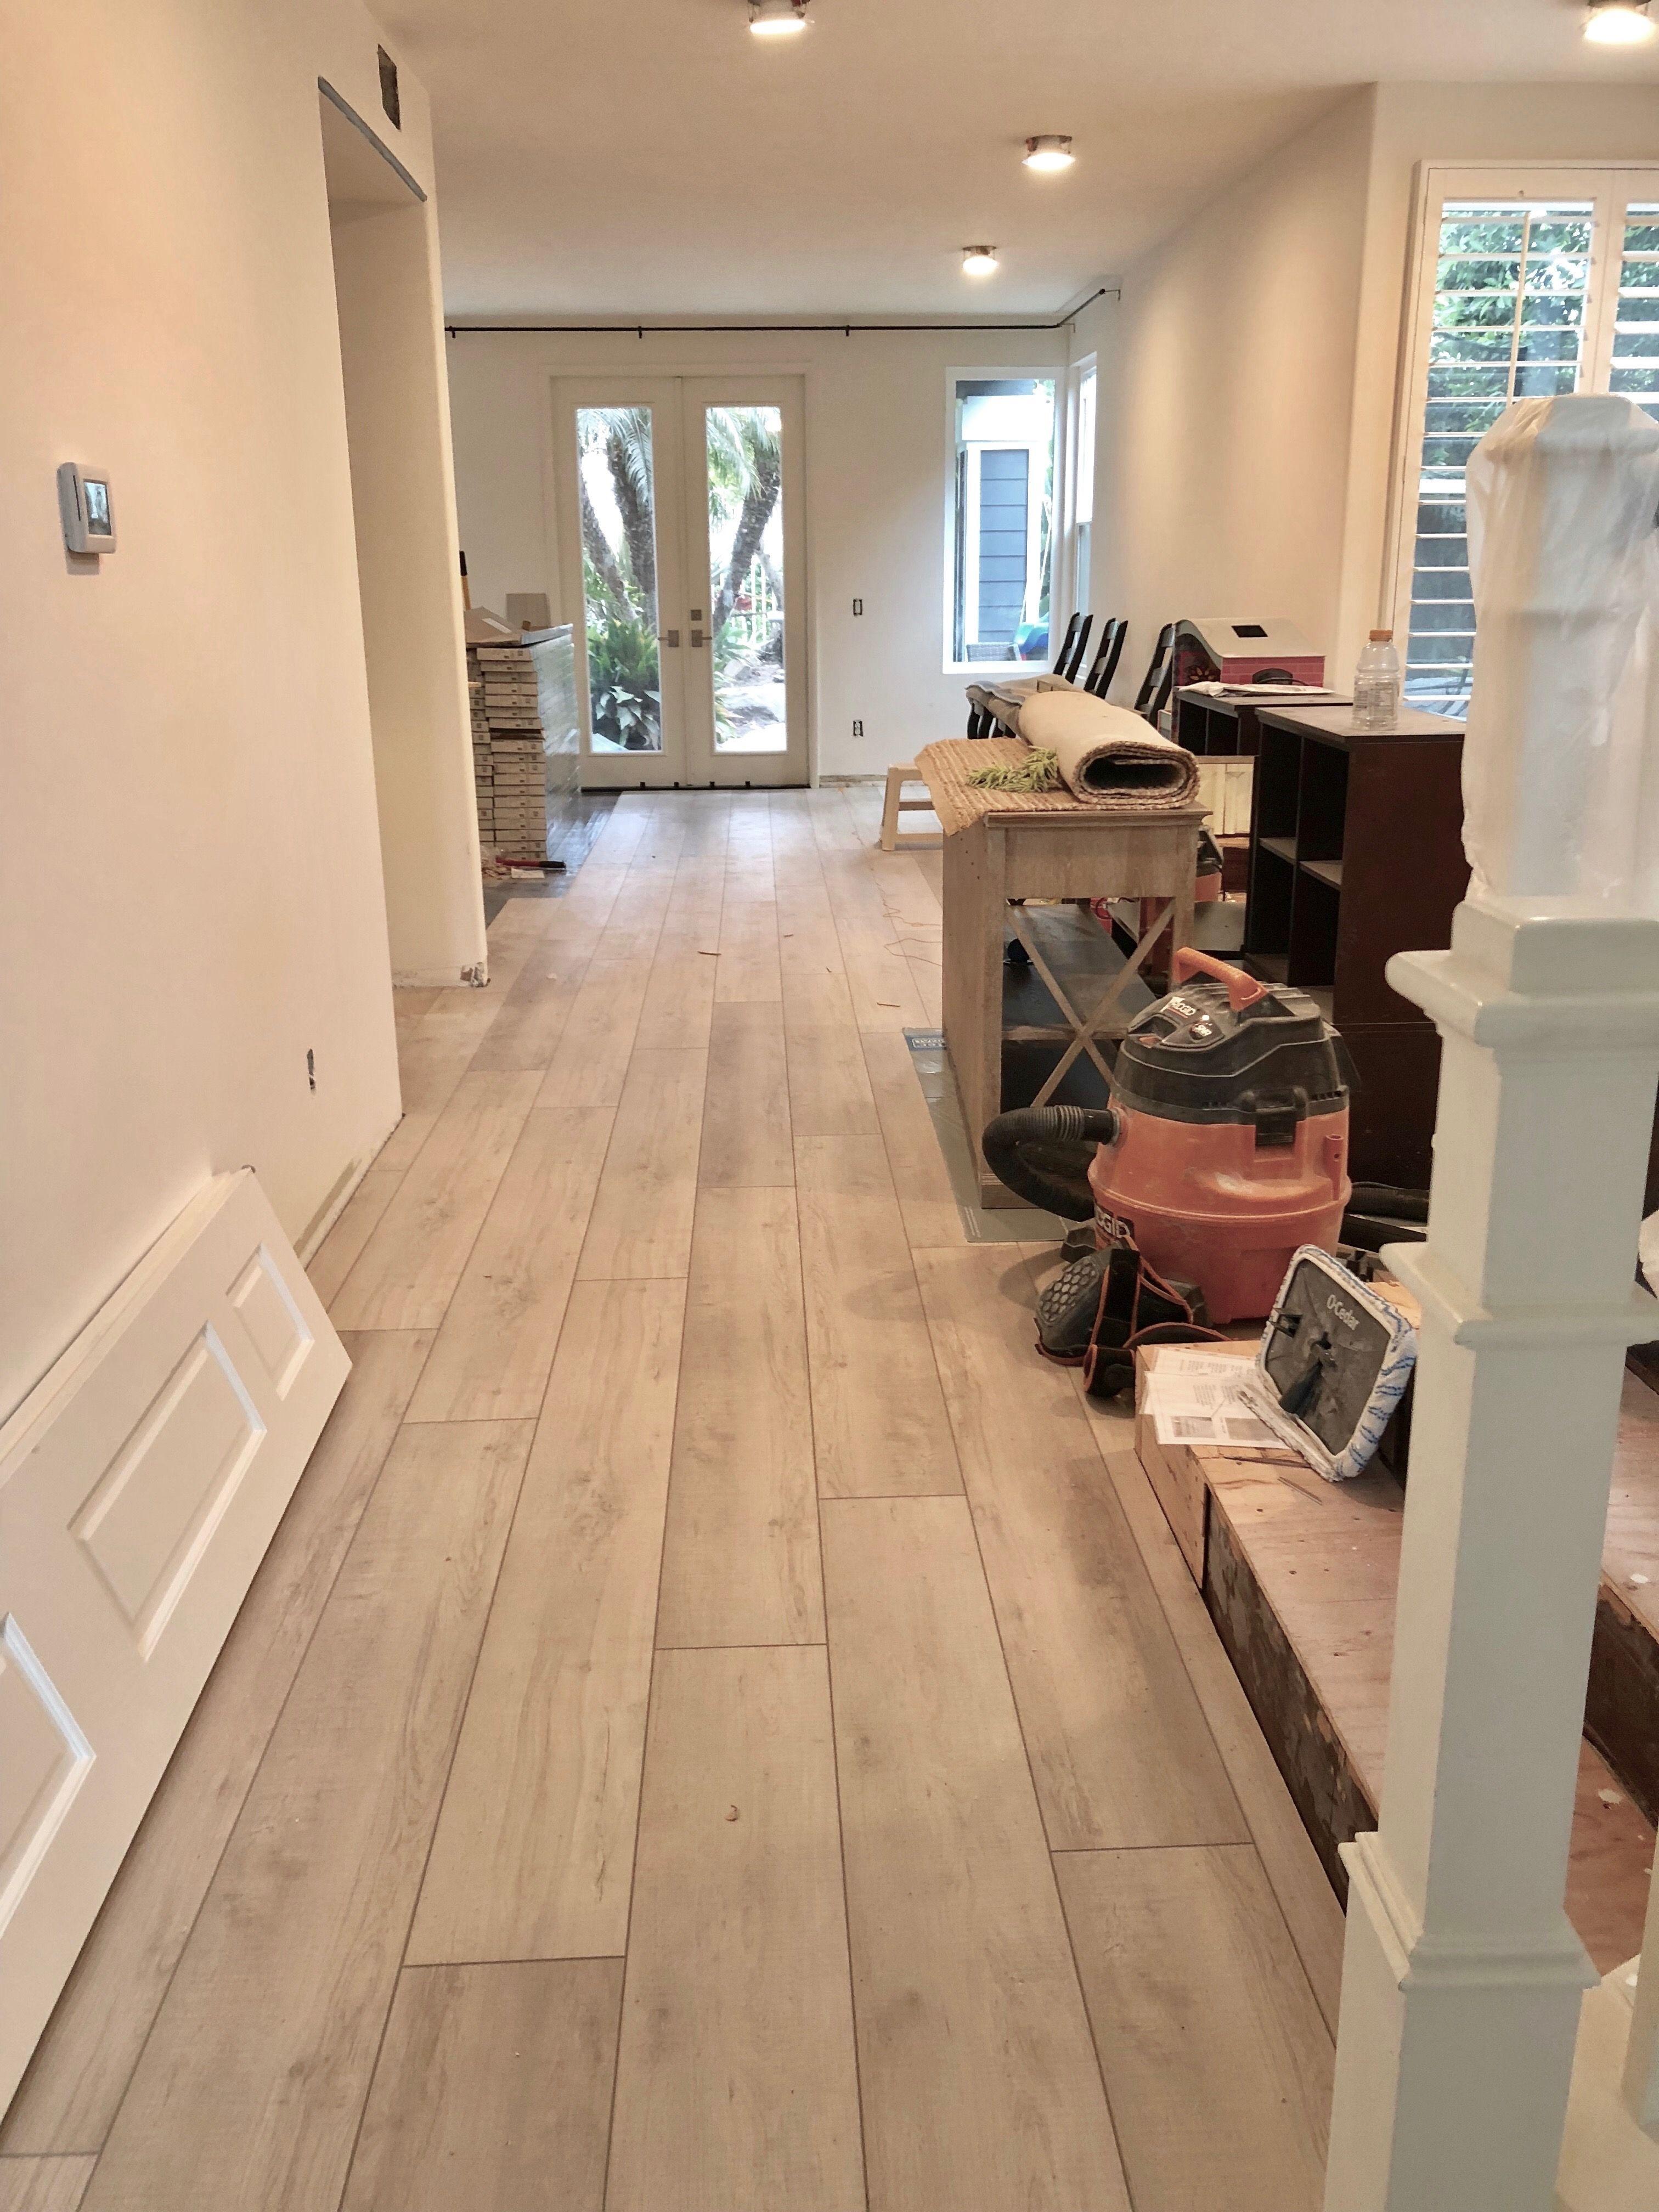 Vinyl Plank Flooring Waterproof Carpet Vidalondon